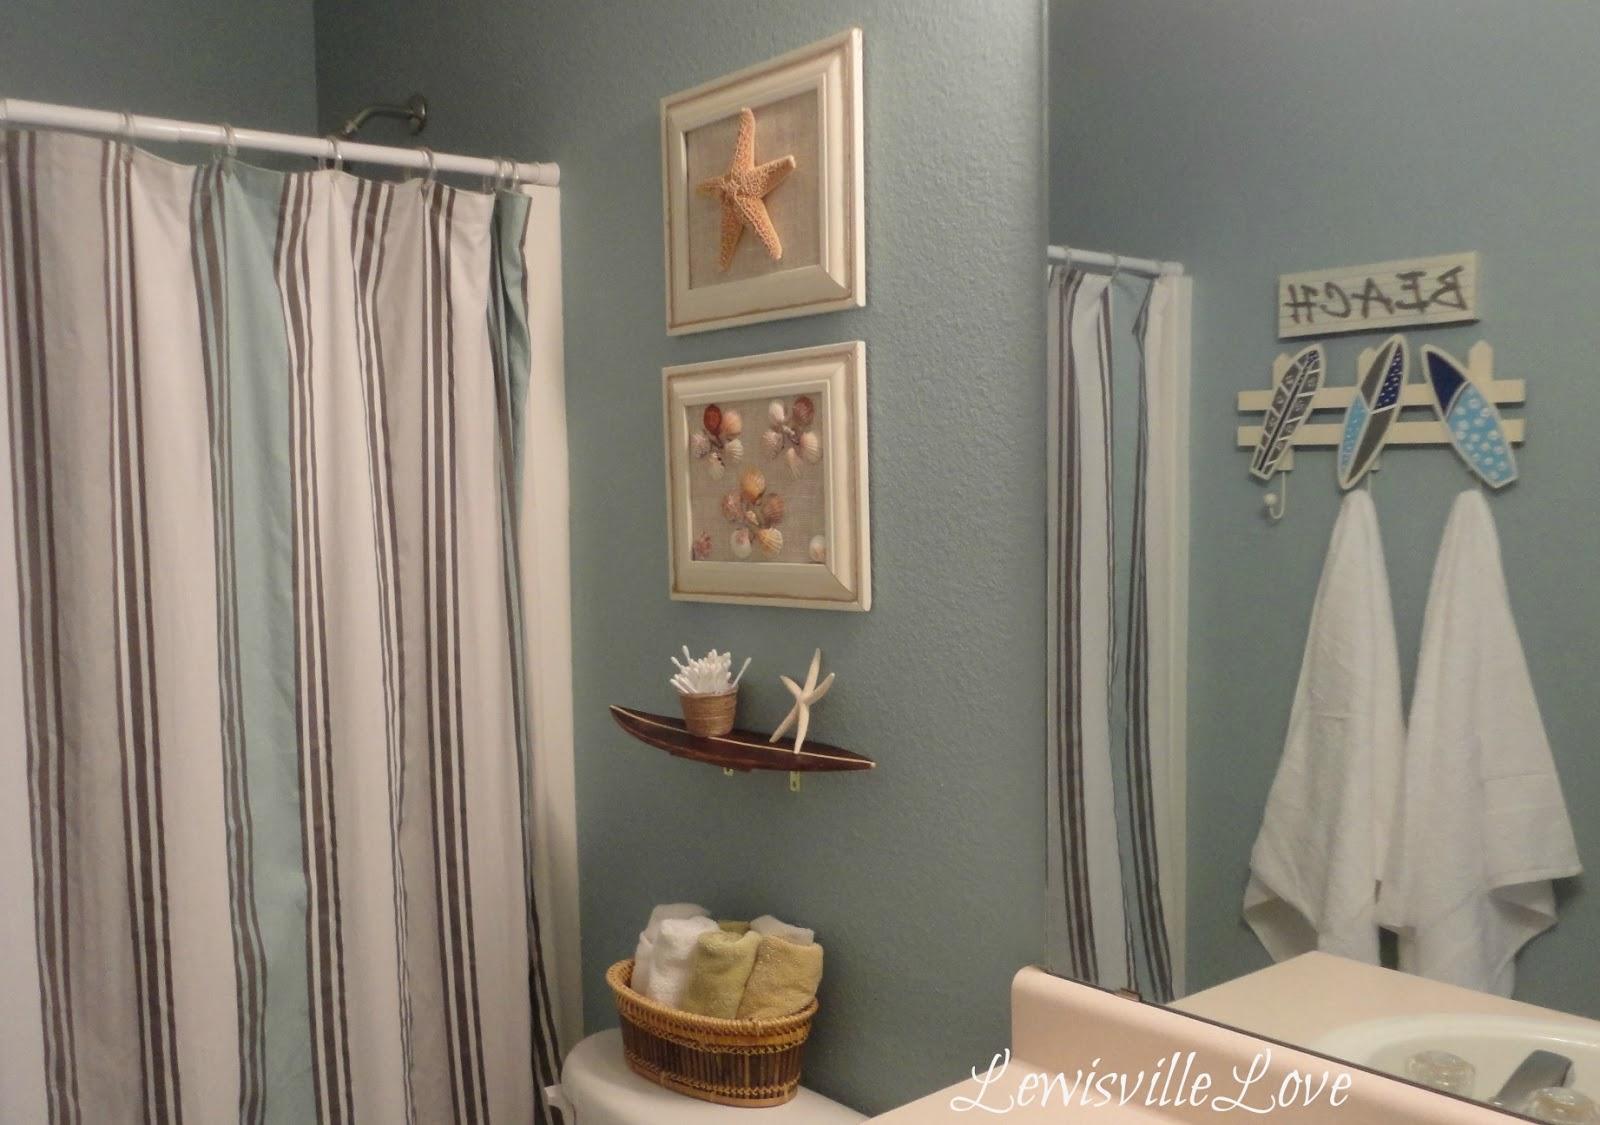 Rustic beach themed bathroom - Relaxing Beach Themed Bathroom Lewisville Love Design Image 7 Of 10